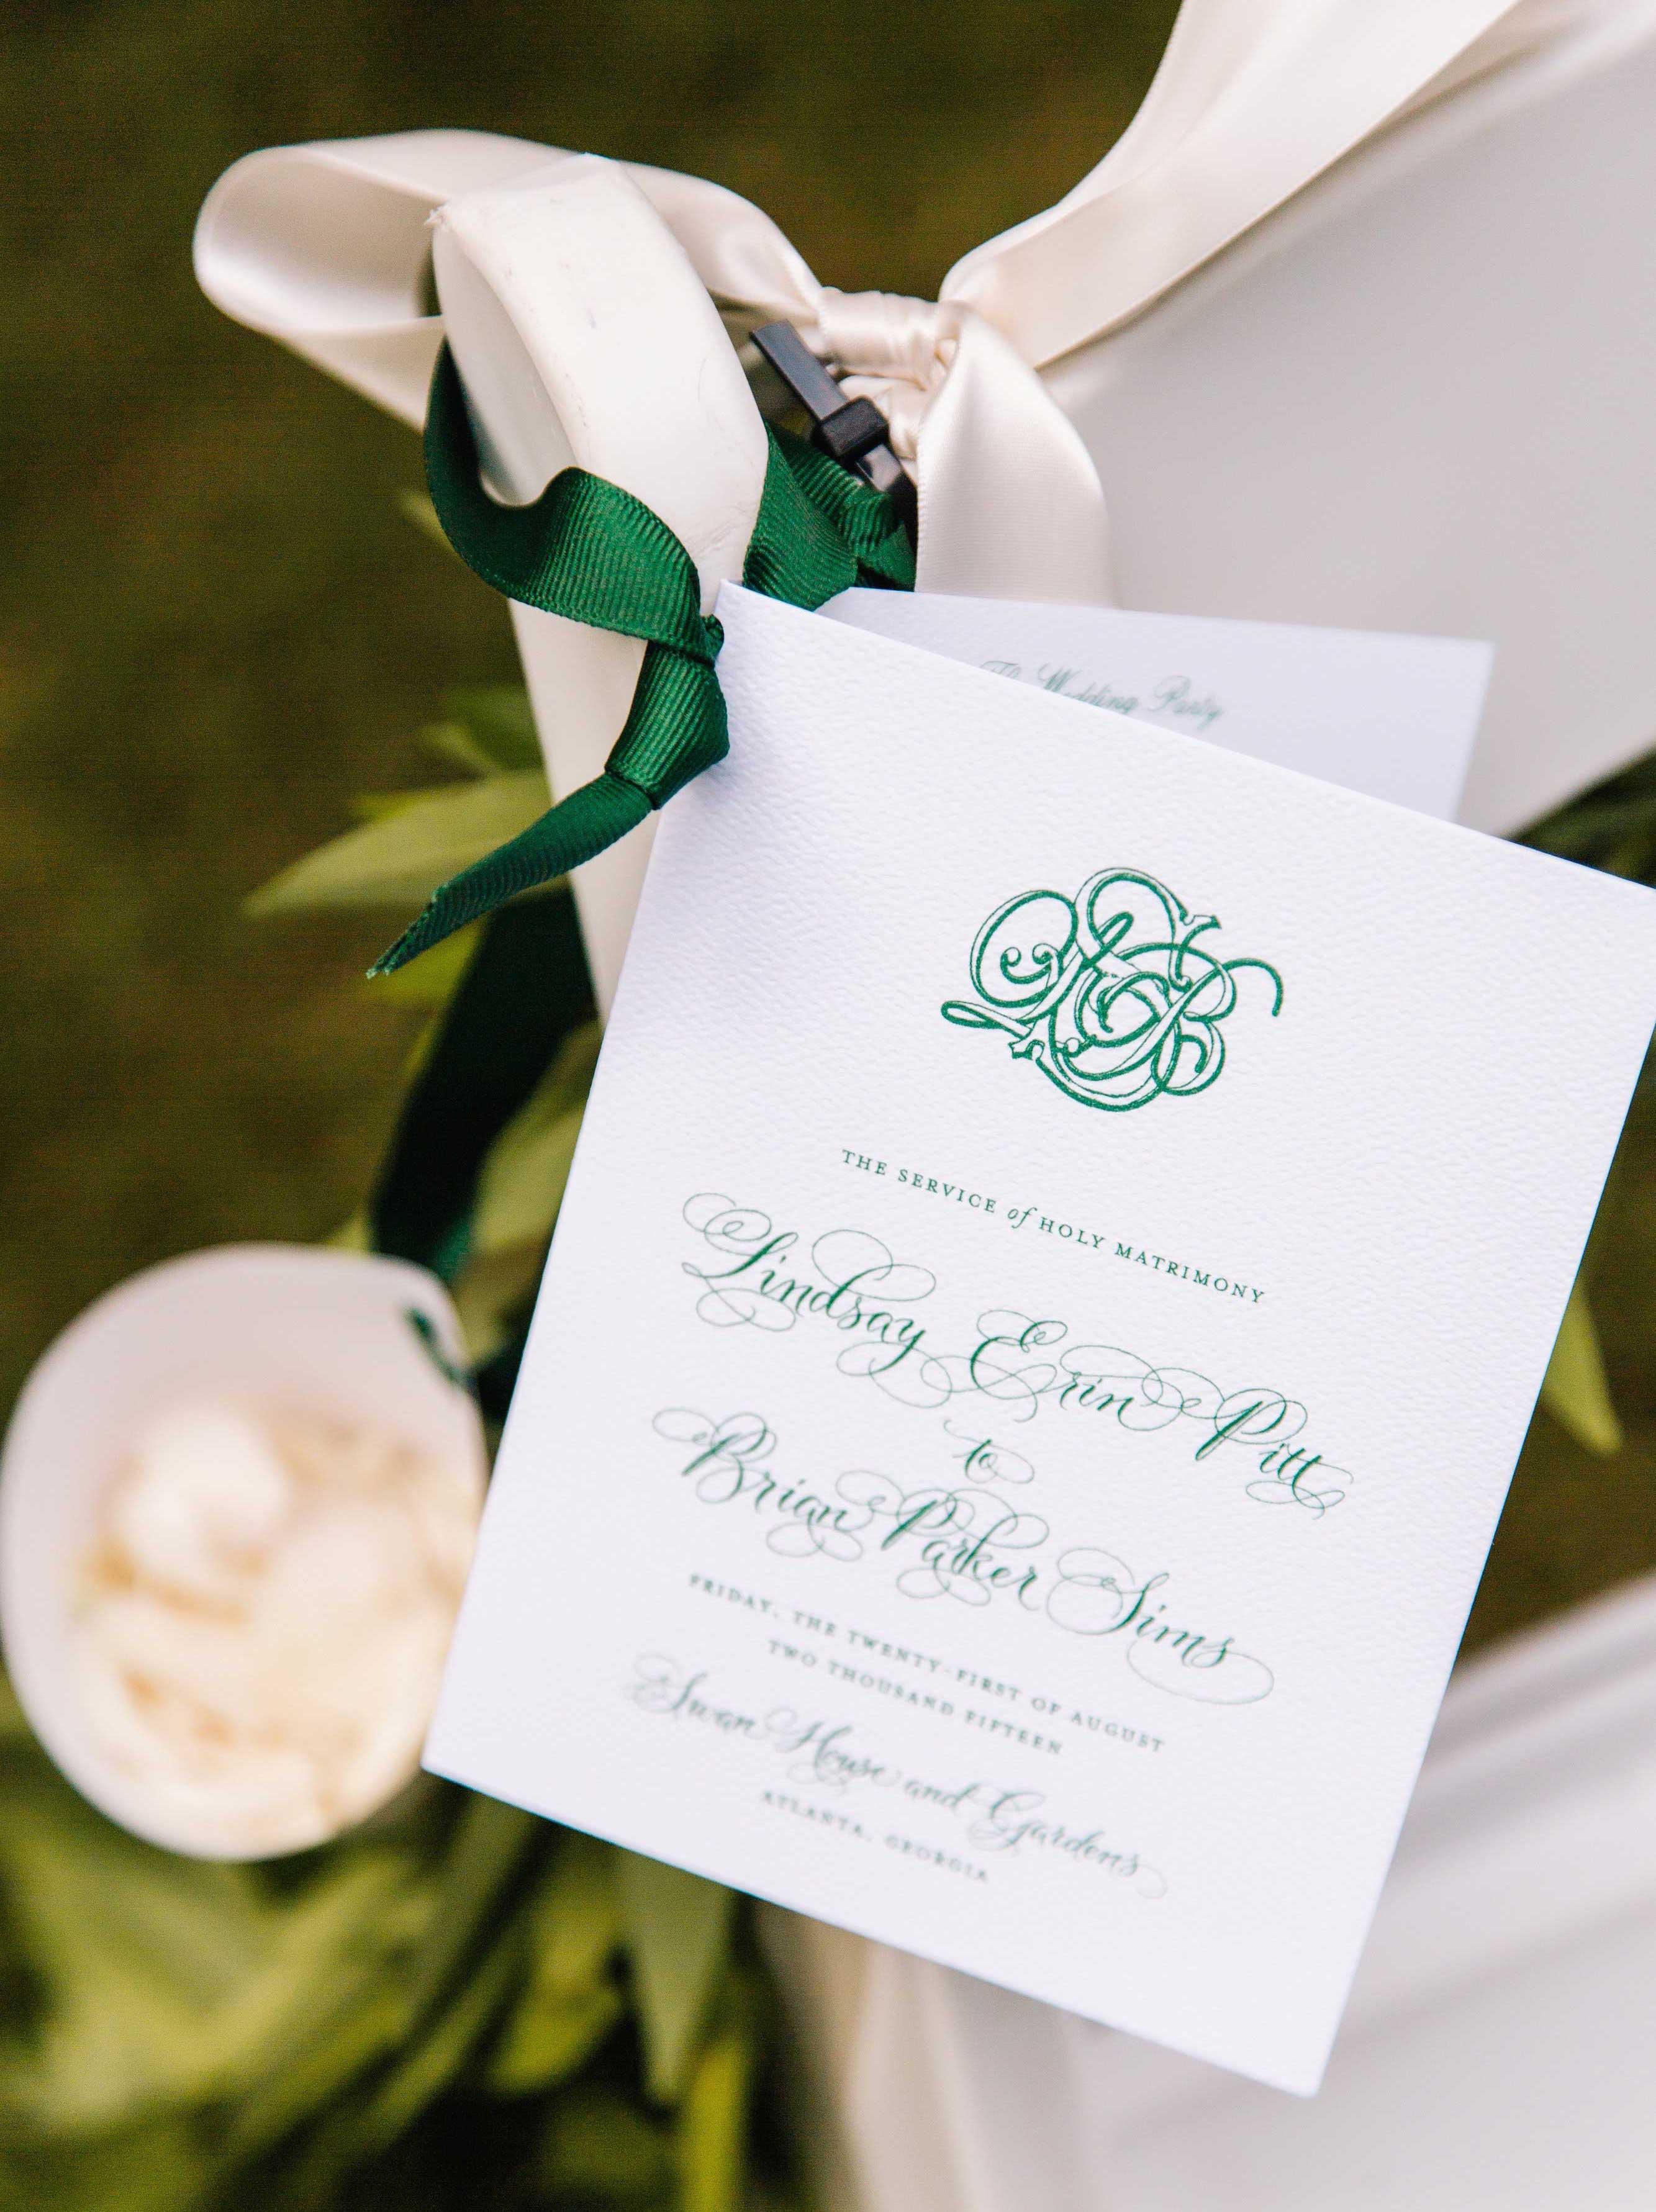 Wedding Color Palette Ideas: Dark Green & Emerald - Inside Weddings